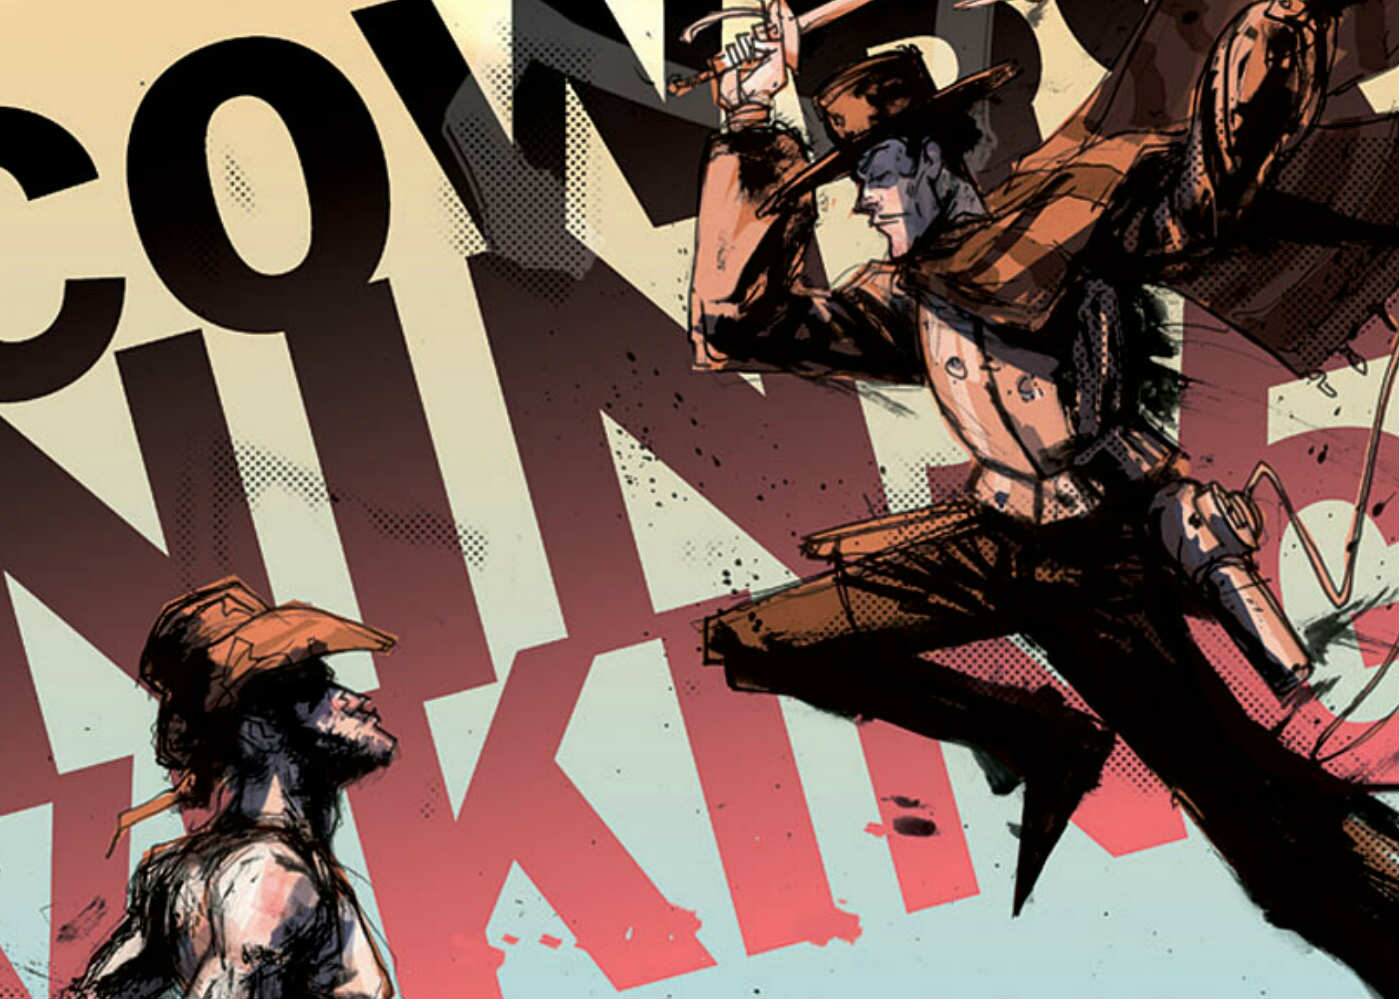 Chris Pratt's Cowboy Ninja Viking Gets a Release Date